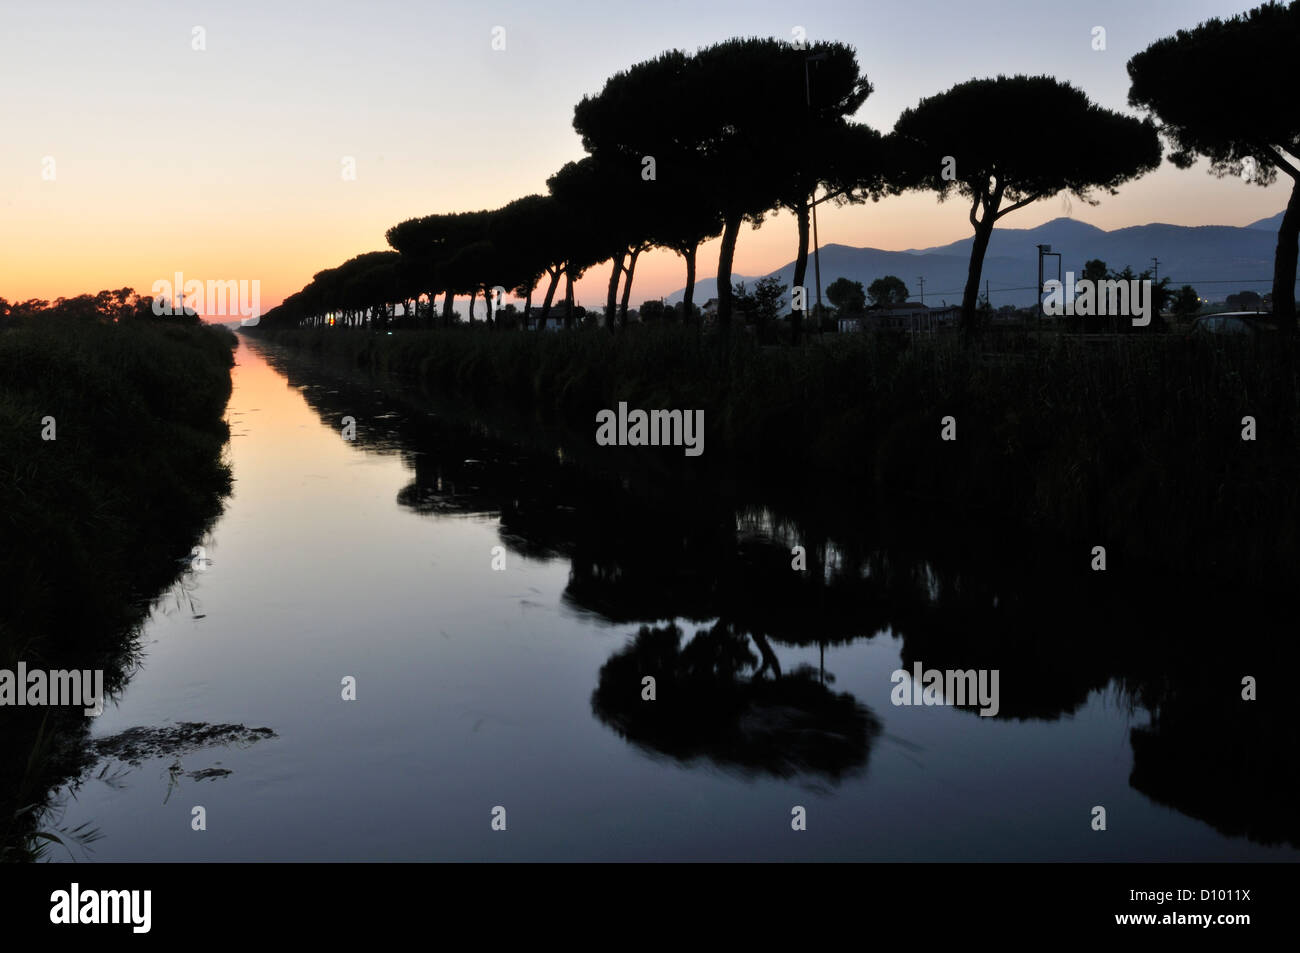 De vidange, de remise en état, de l'Agro Pontino Pontinia, Latina, Latium, Italie Photo Stock